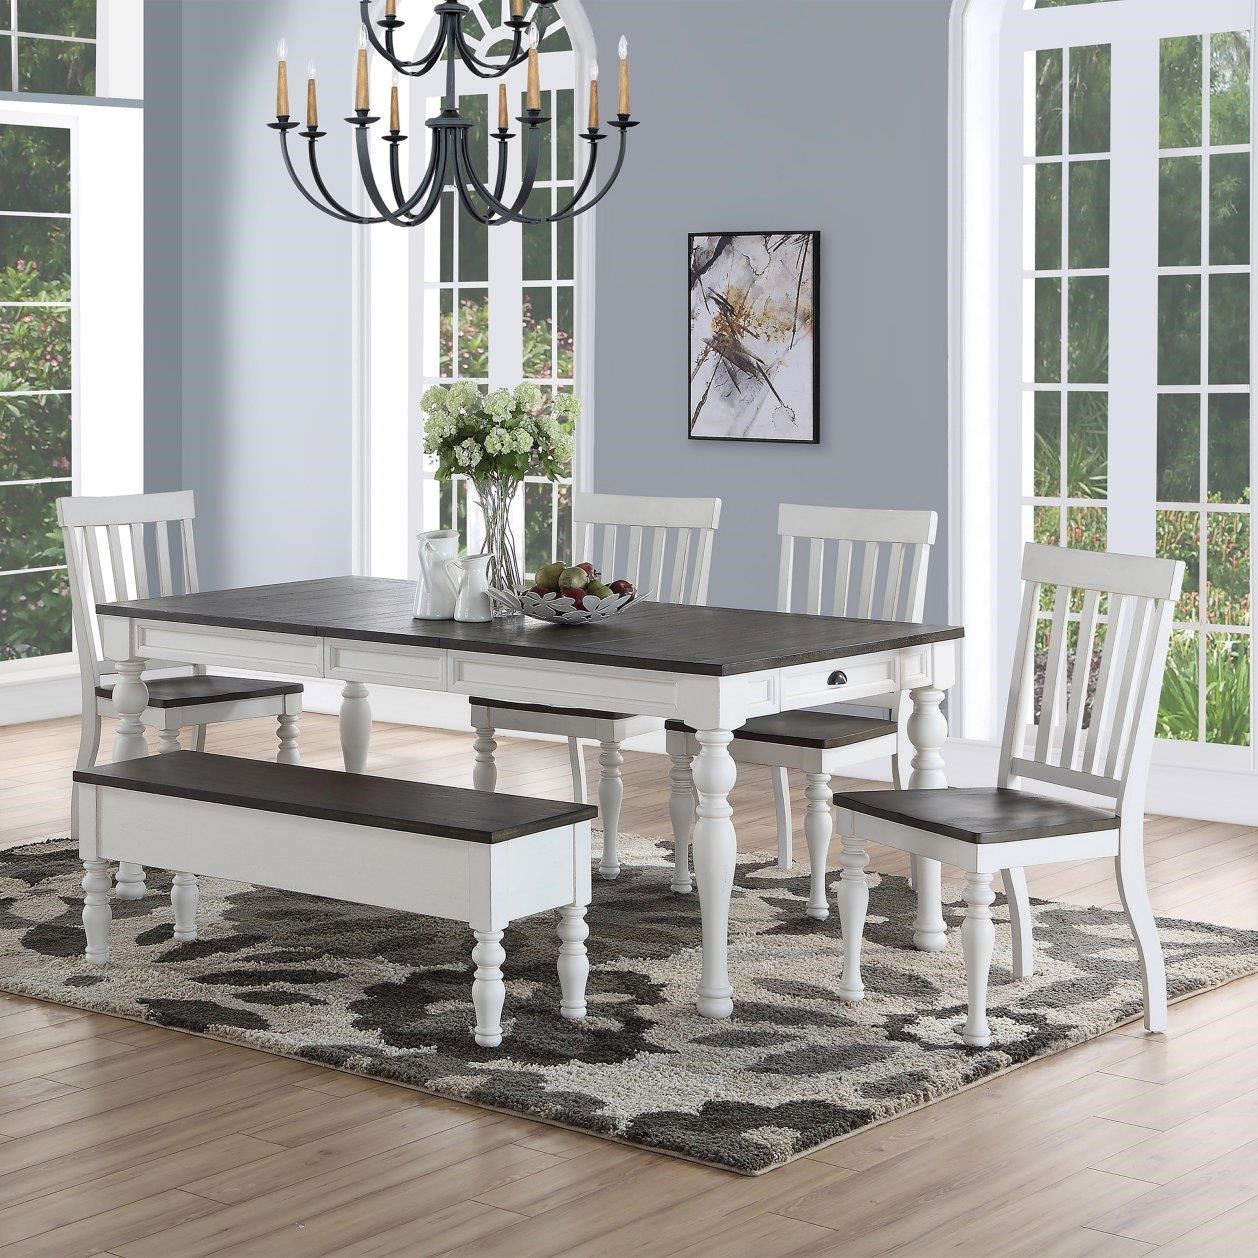 Joanna Dining Table Set at Ruby Gordon Home